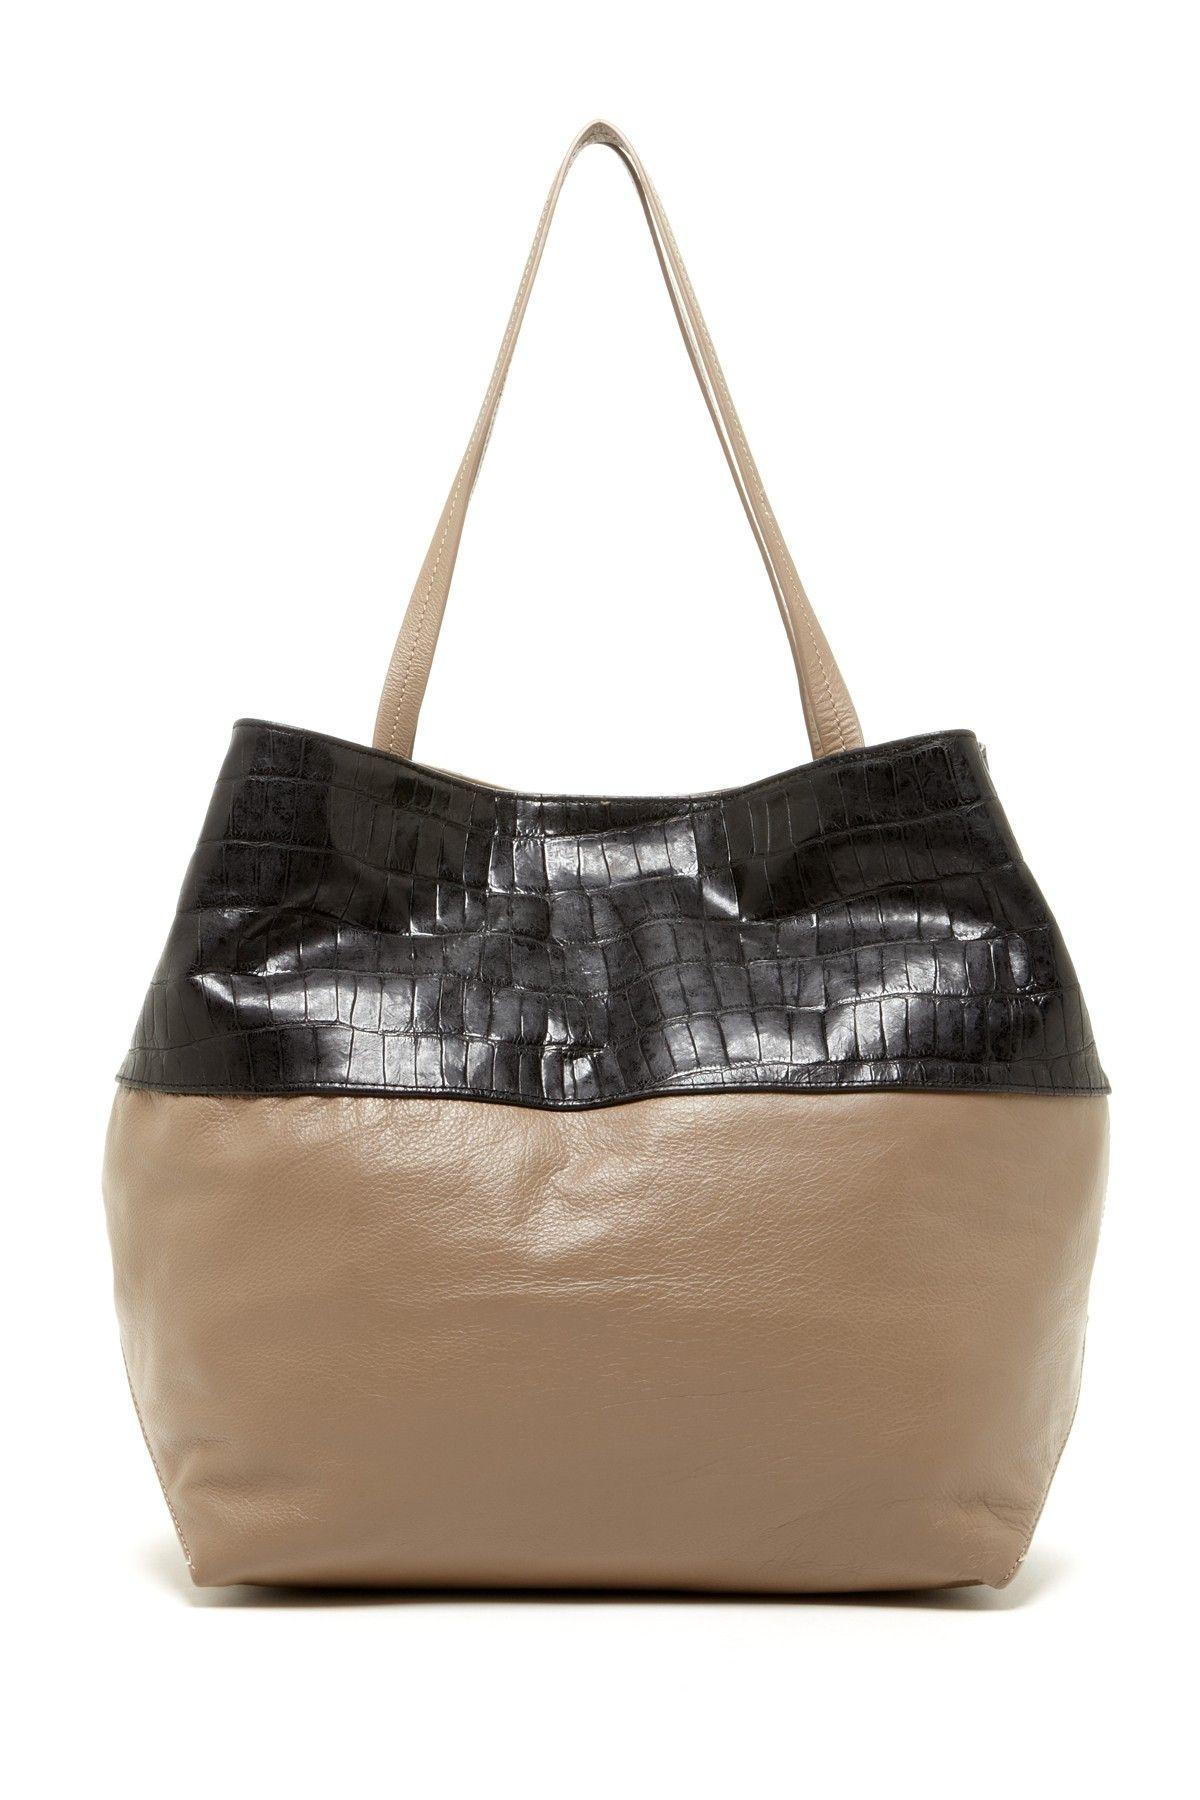 Joie Handbags Huntley Colorblock Tote Bags